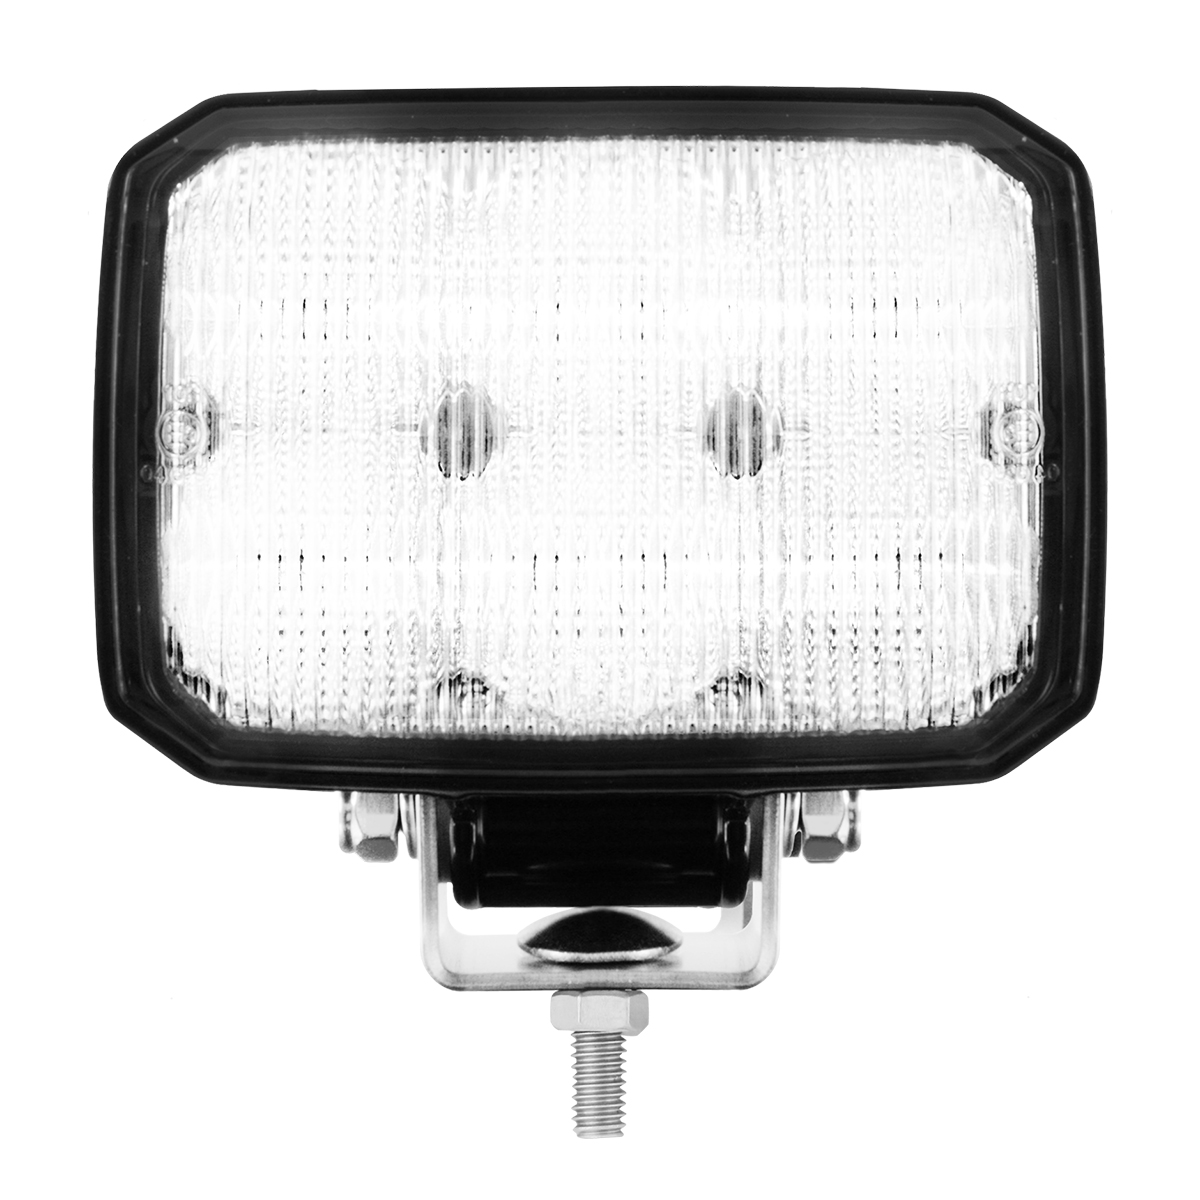 76361 Medium High Power LED Flood Light